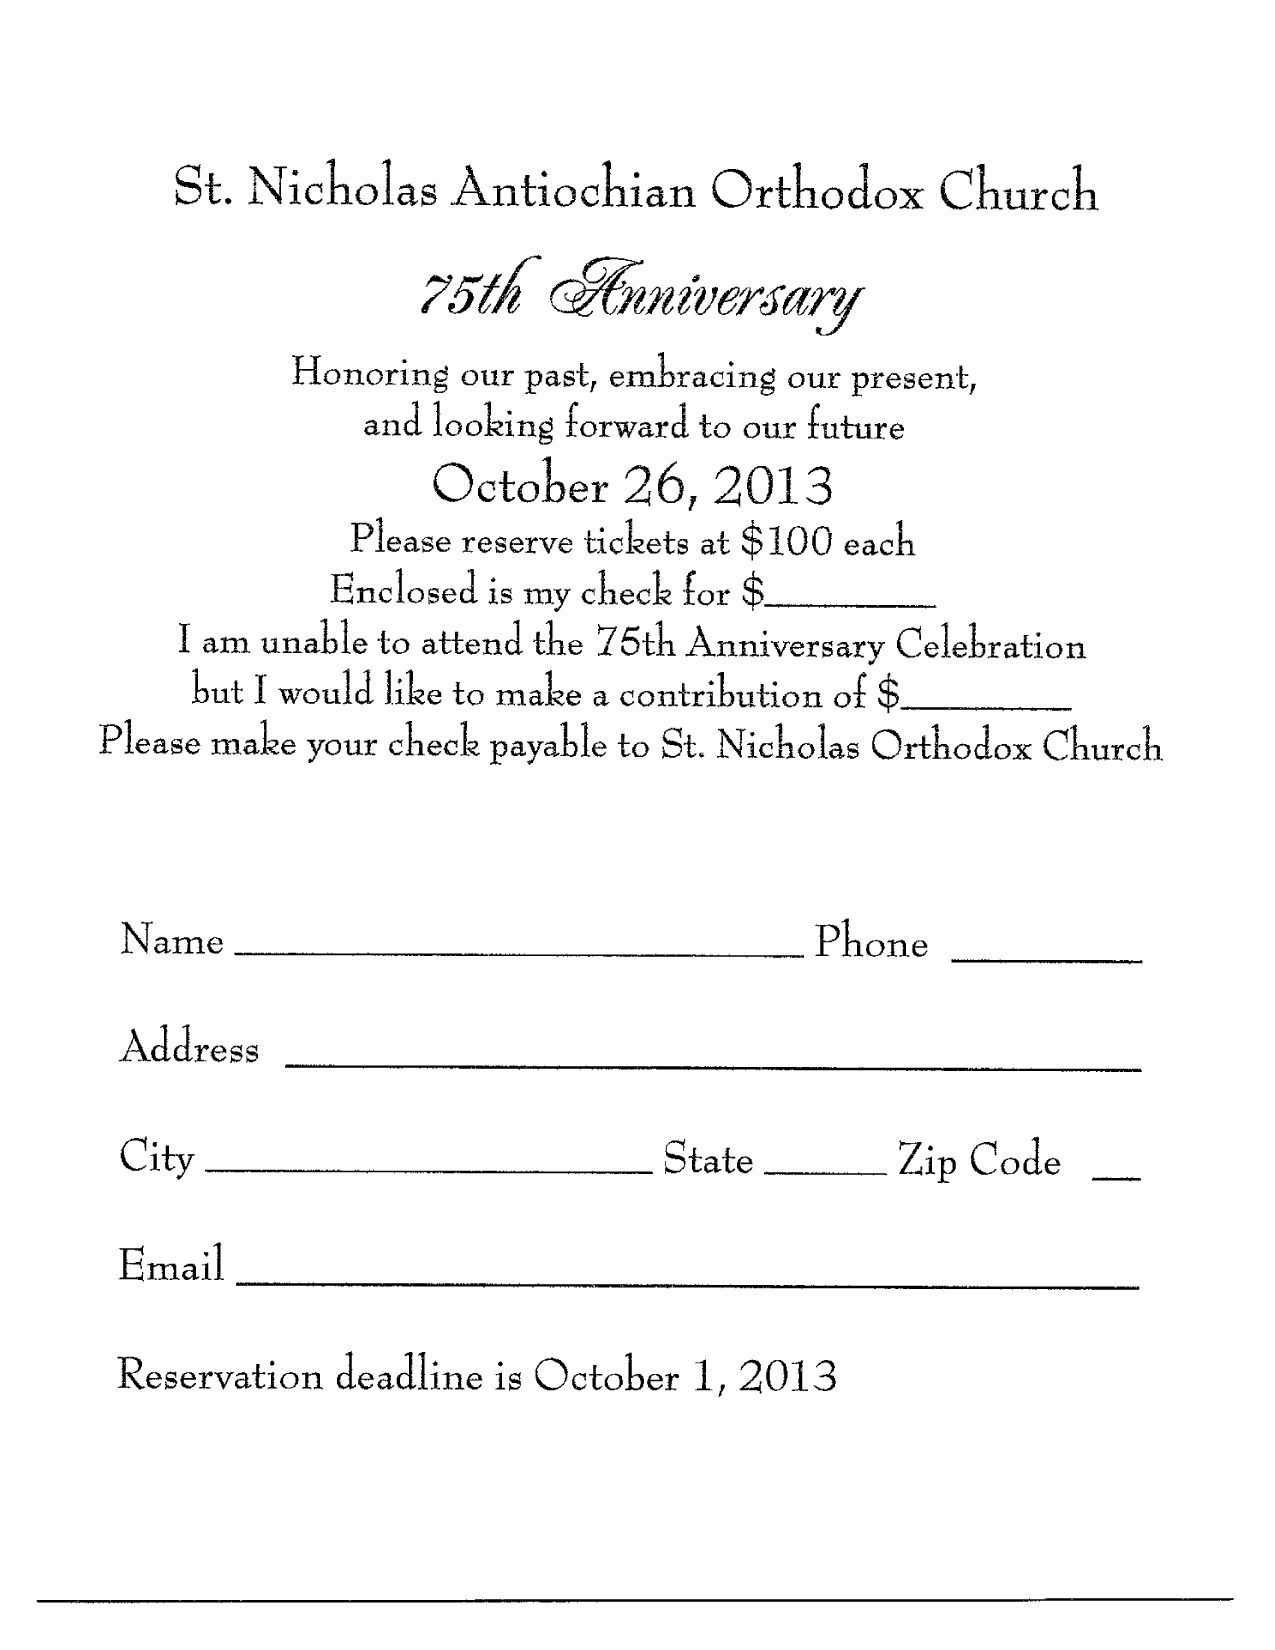 Image result for church anniversary invitation churchs 75th image result for church anniversary invitation altavistaventures Choice Image